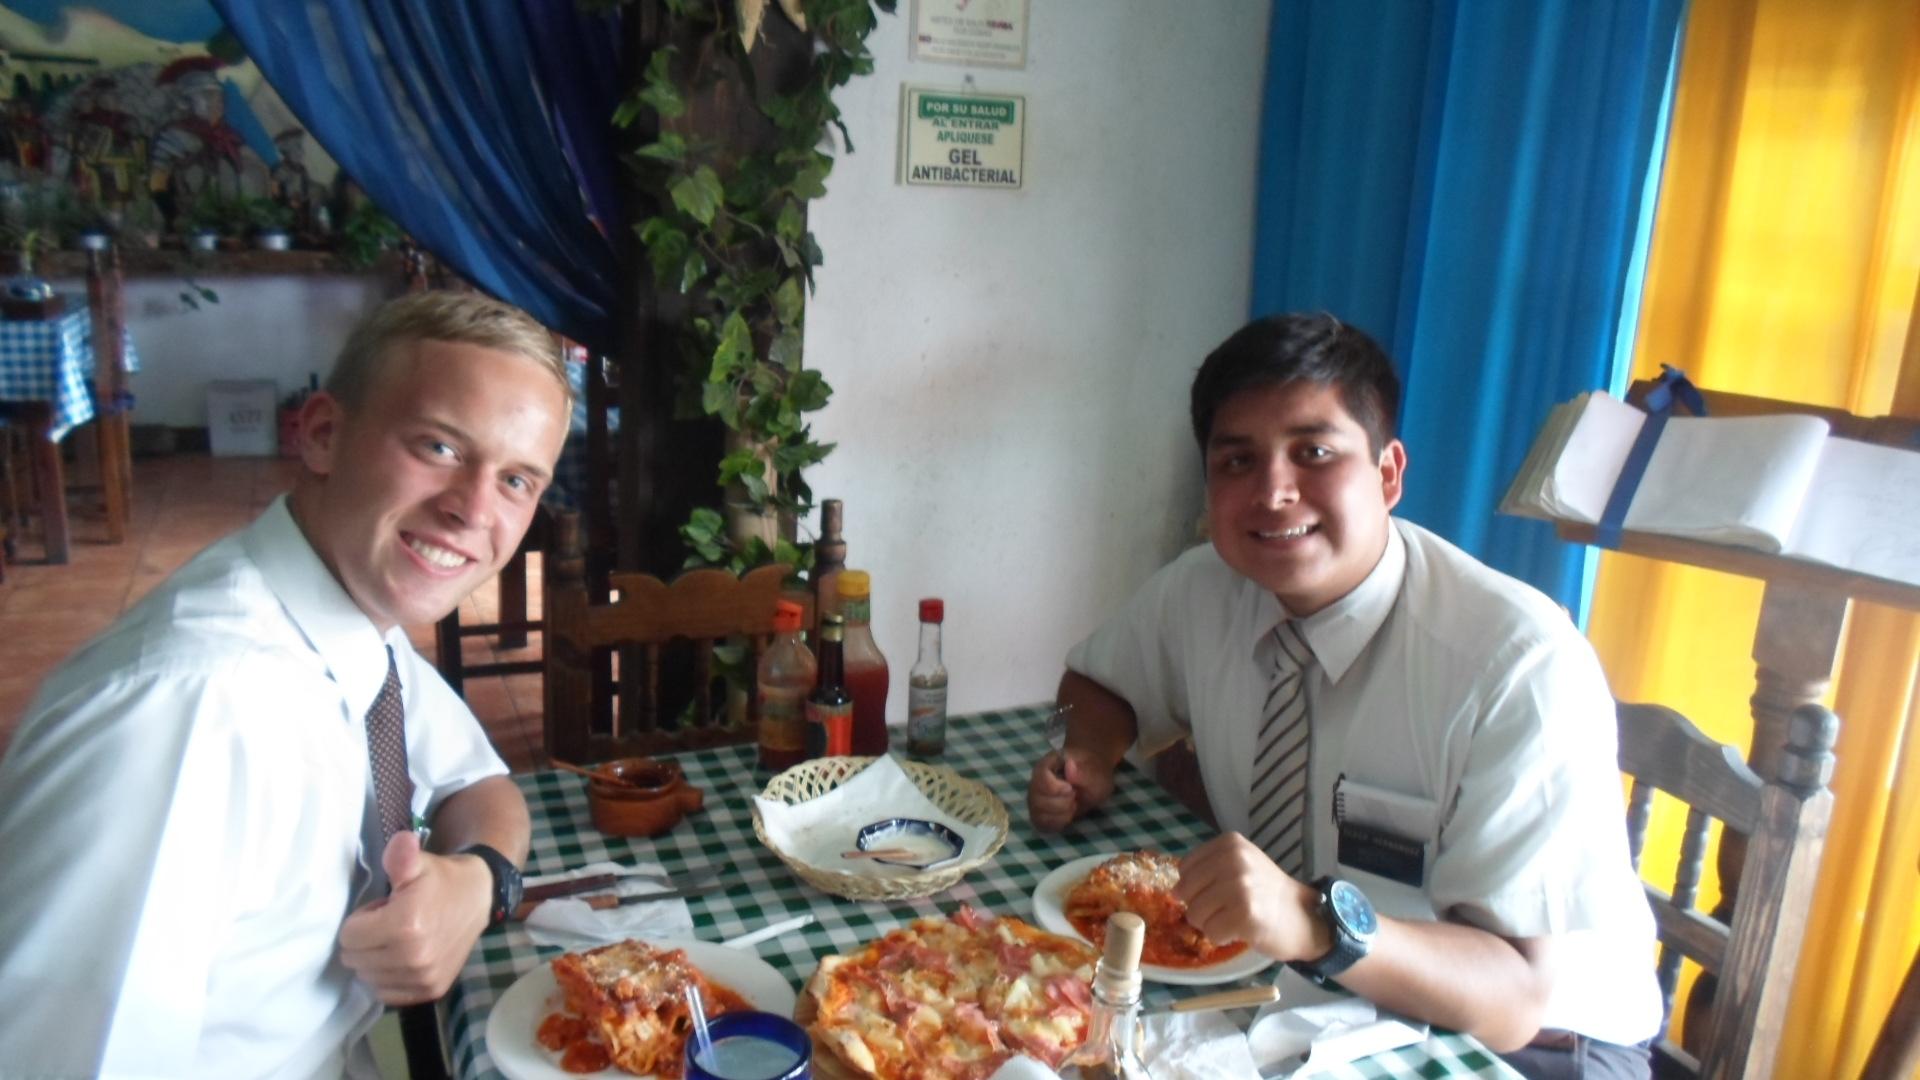 Elder Jason Blanding and Elder Hernandez enjoying Lasagna!